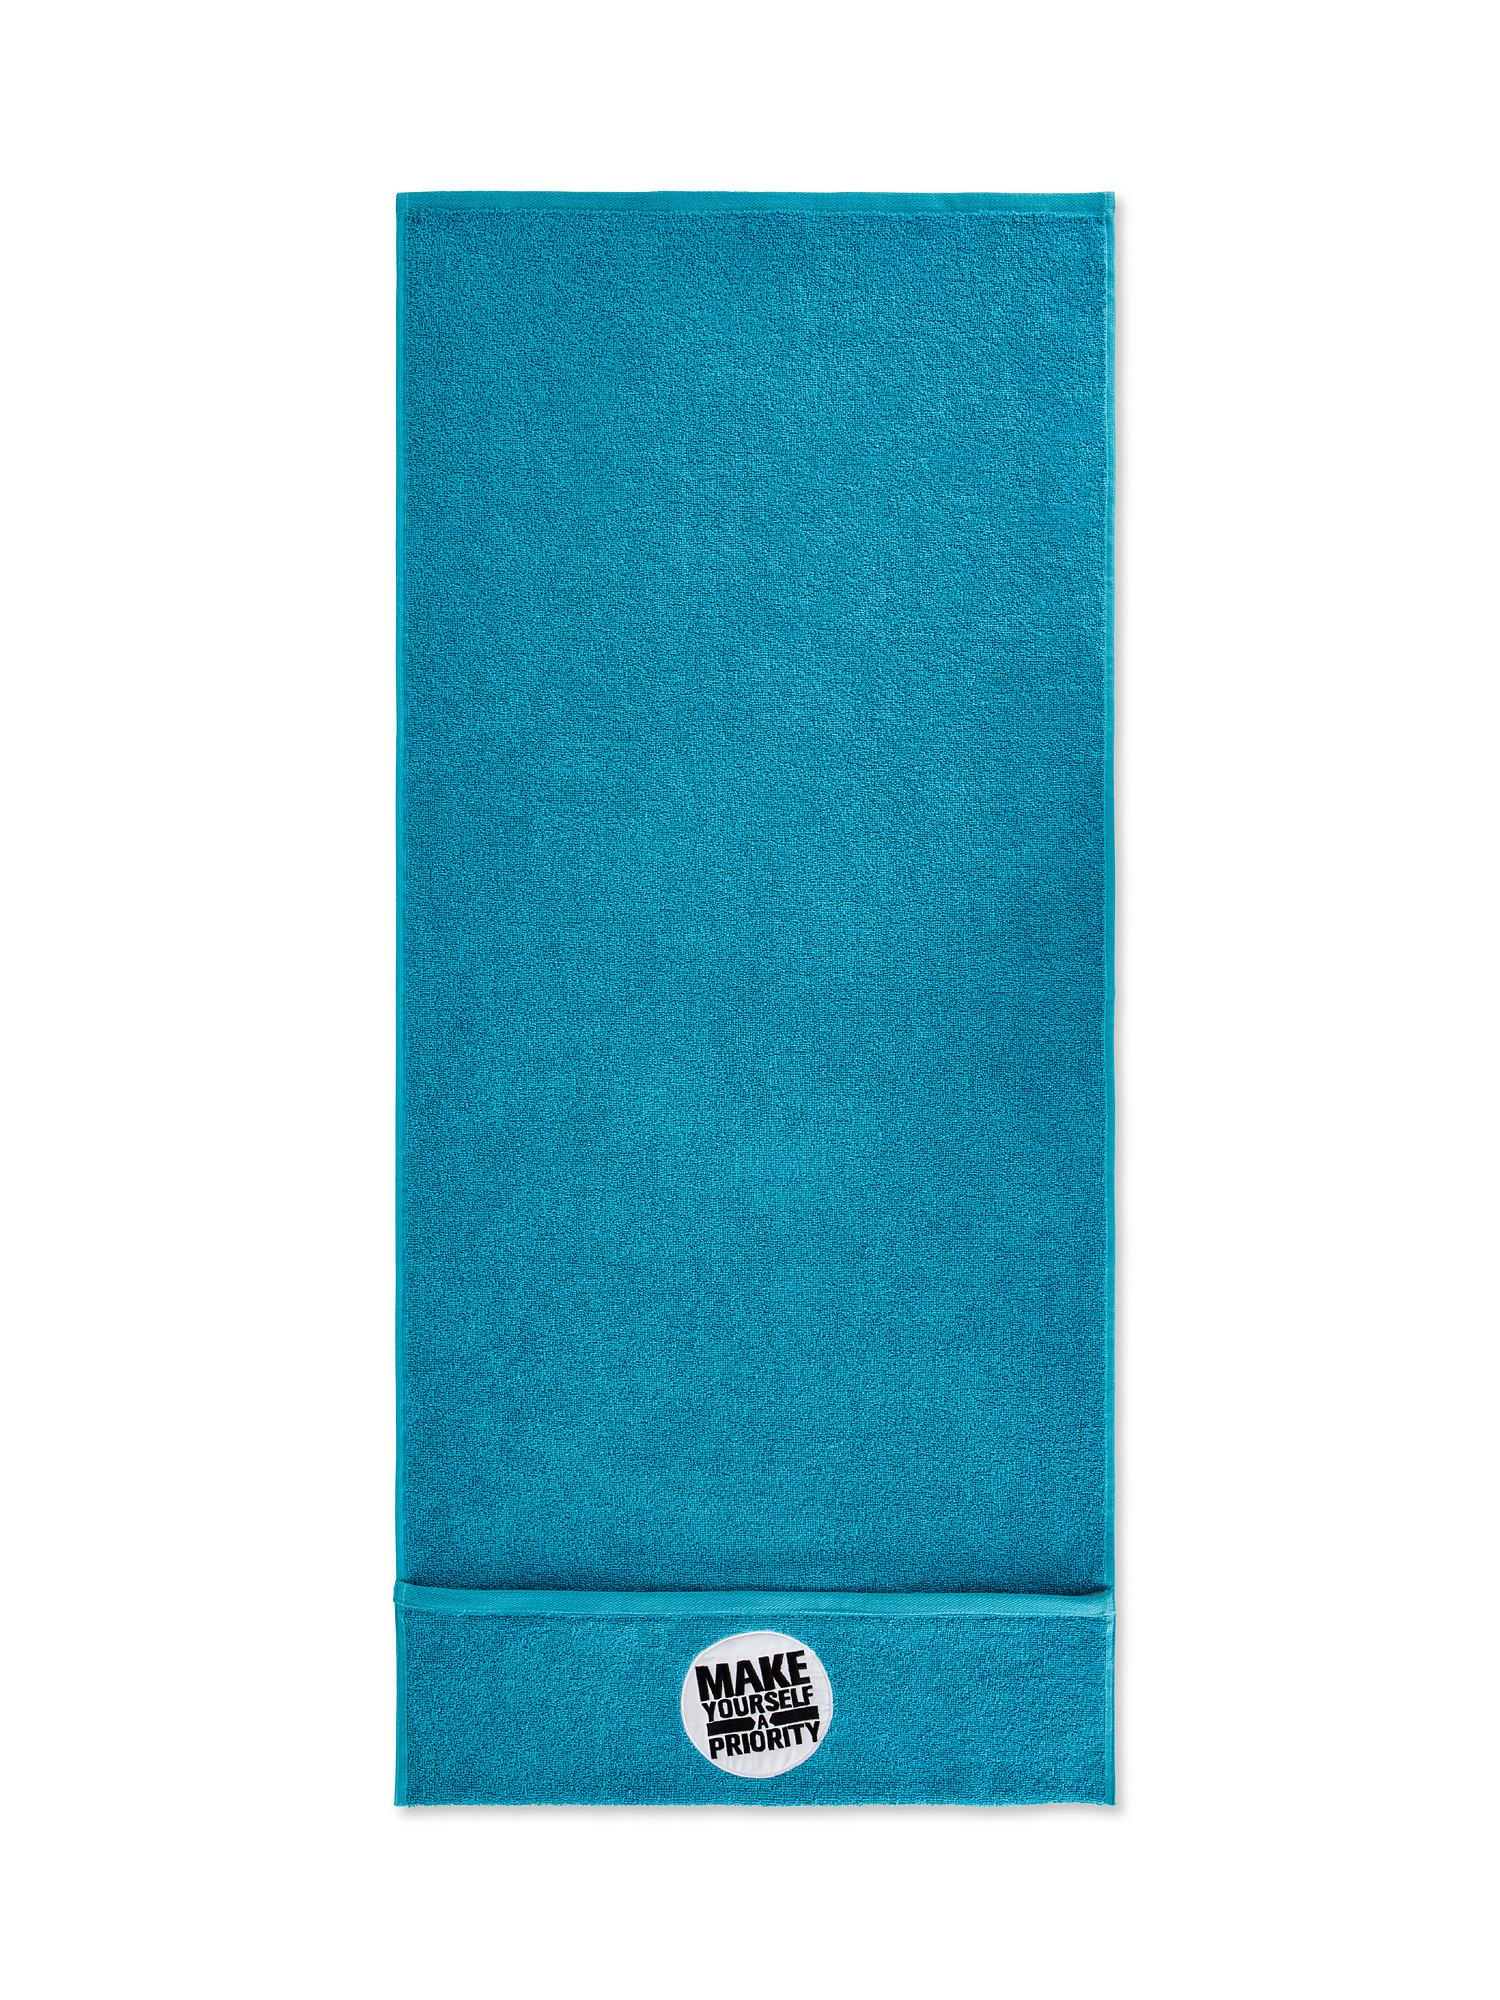 Asciugamano da palestra e fitness, Azzurro, large image number 1